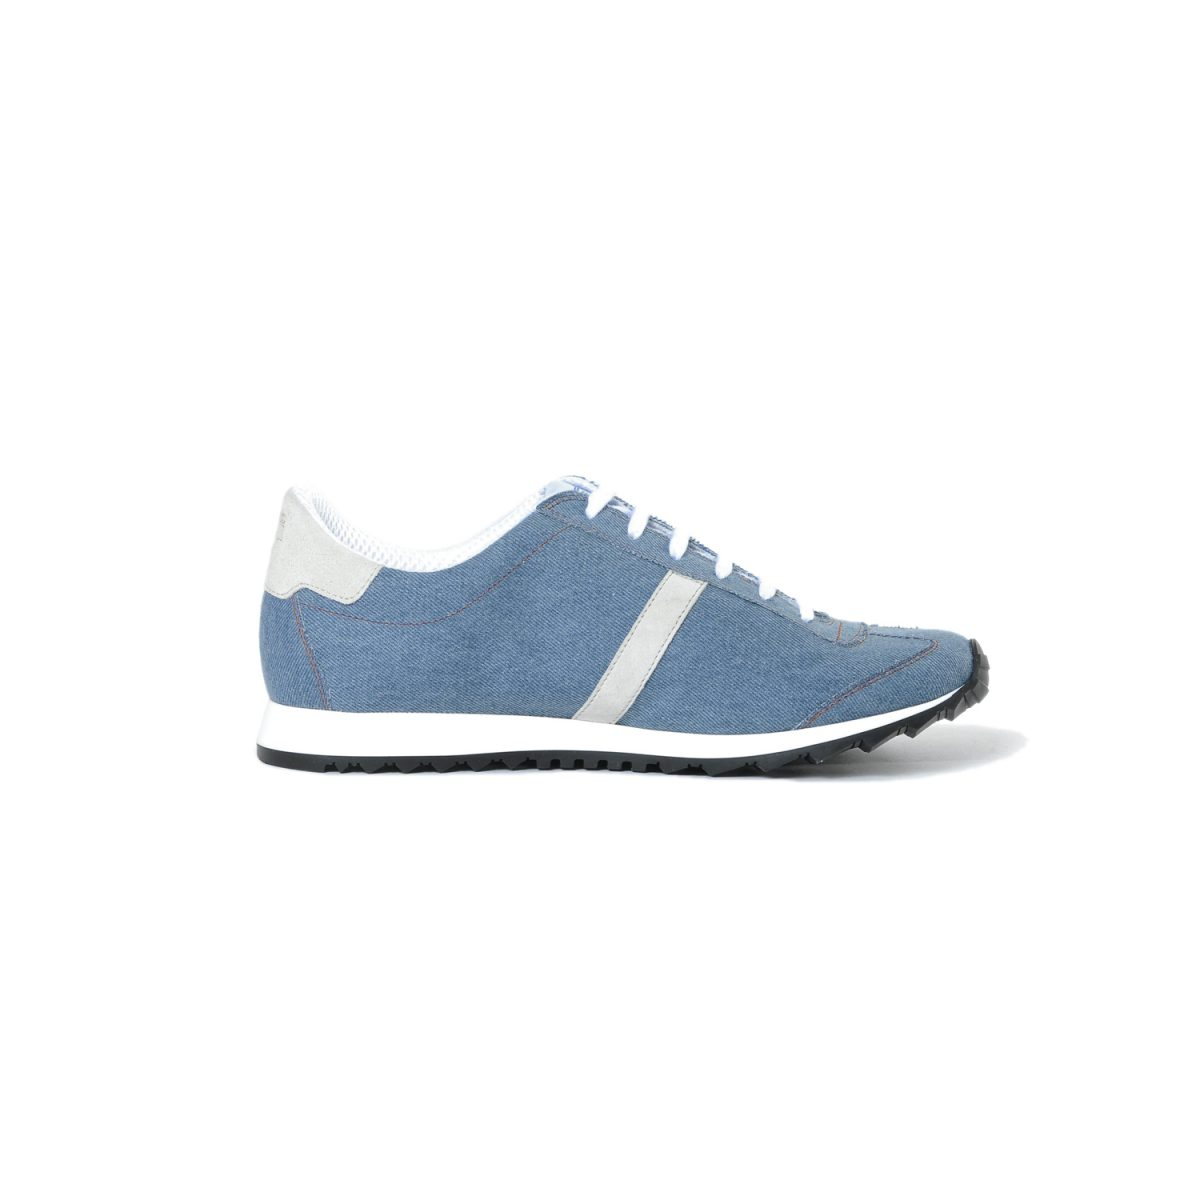 Tisza cipő - Martfű - Denim